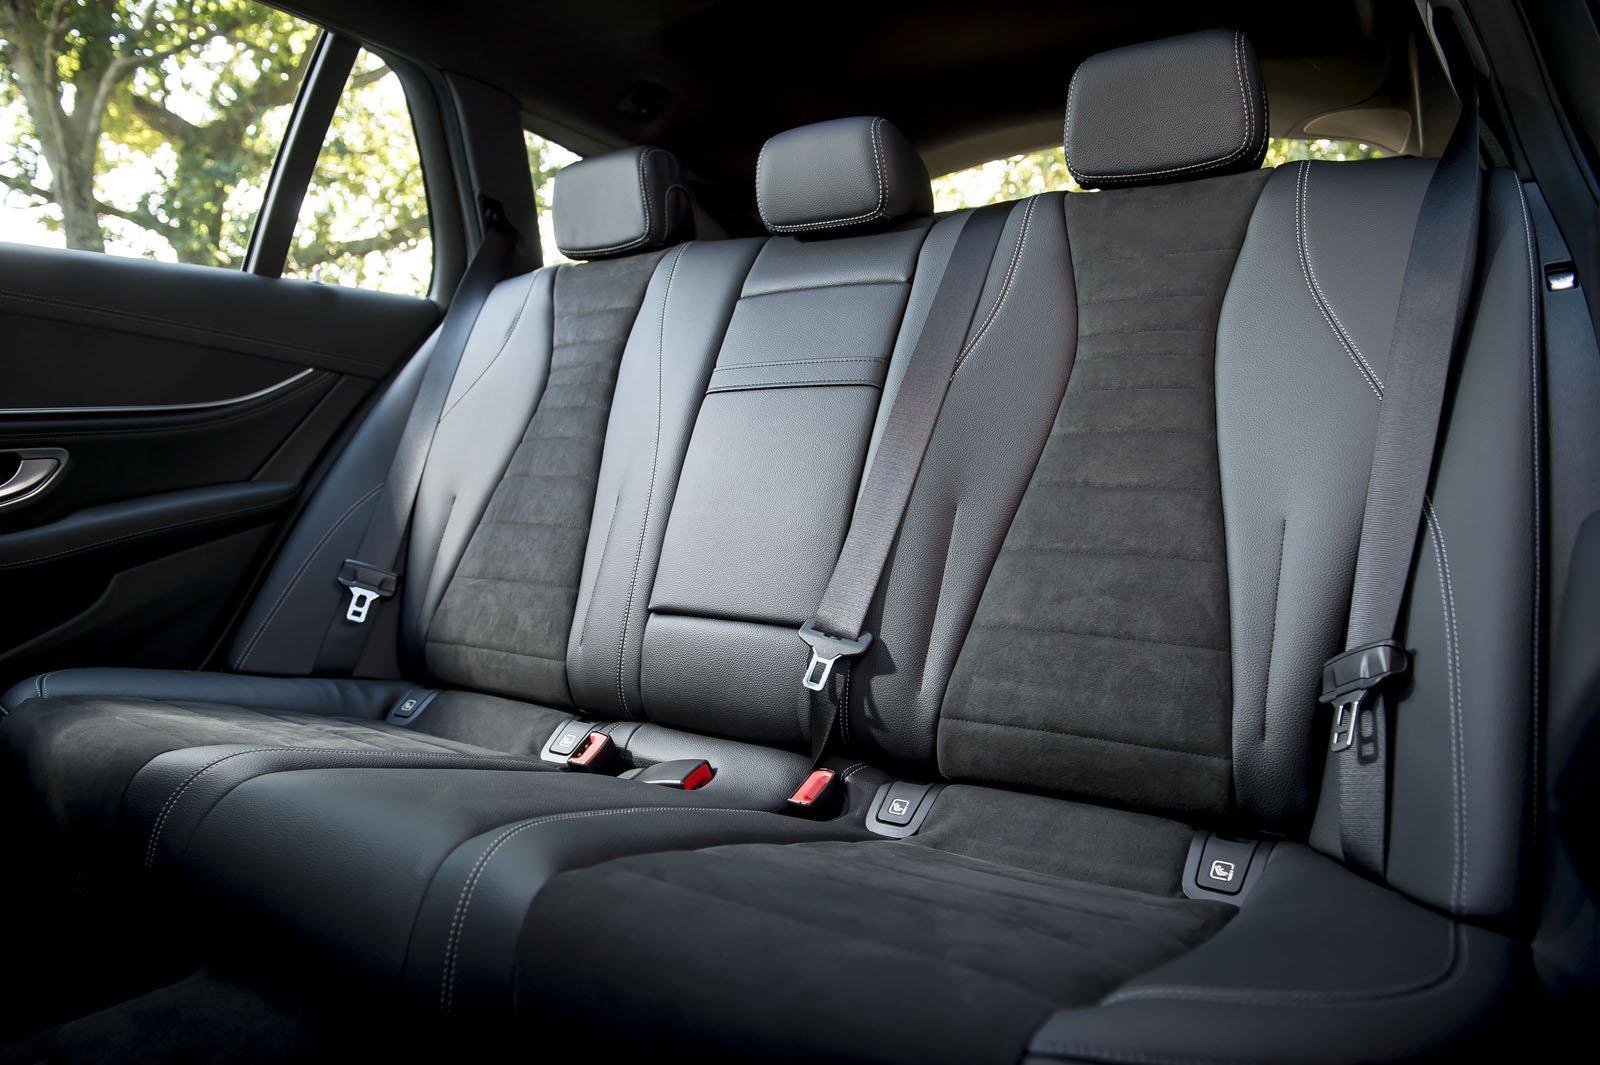 Mercedes-Benz E-Class Estate rear seat